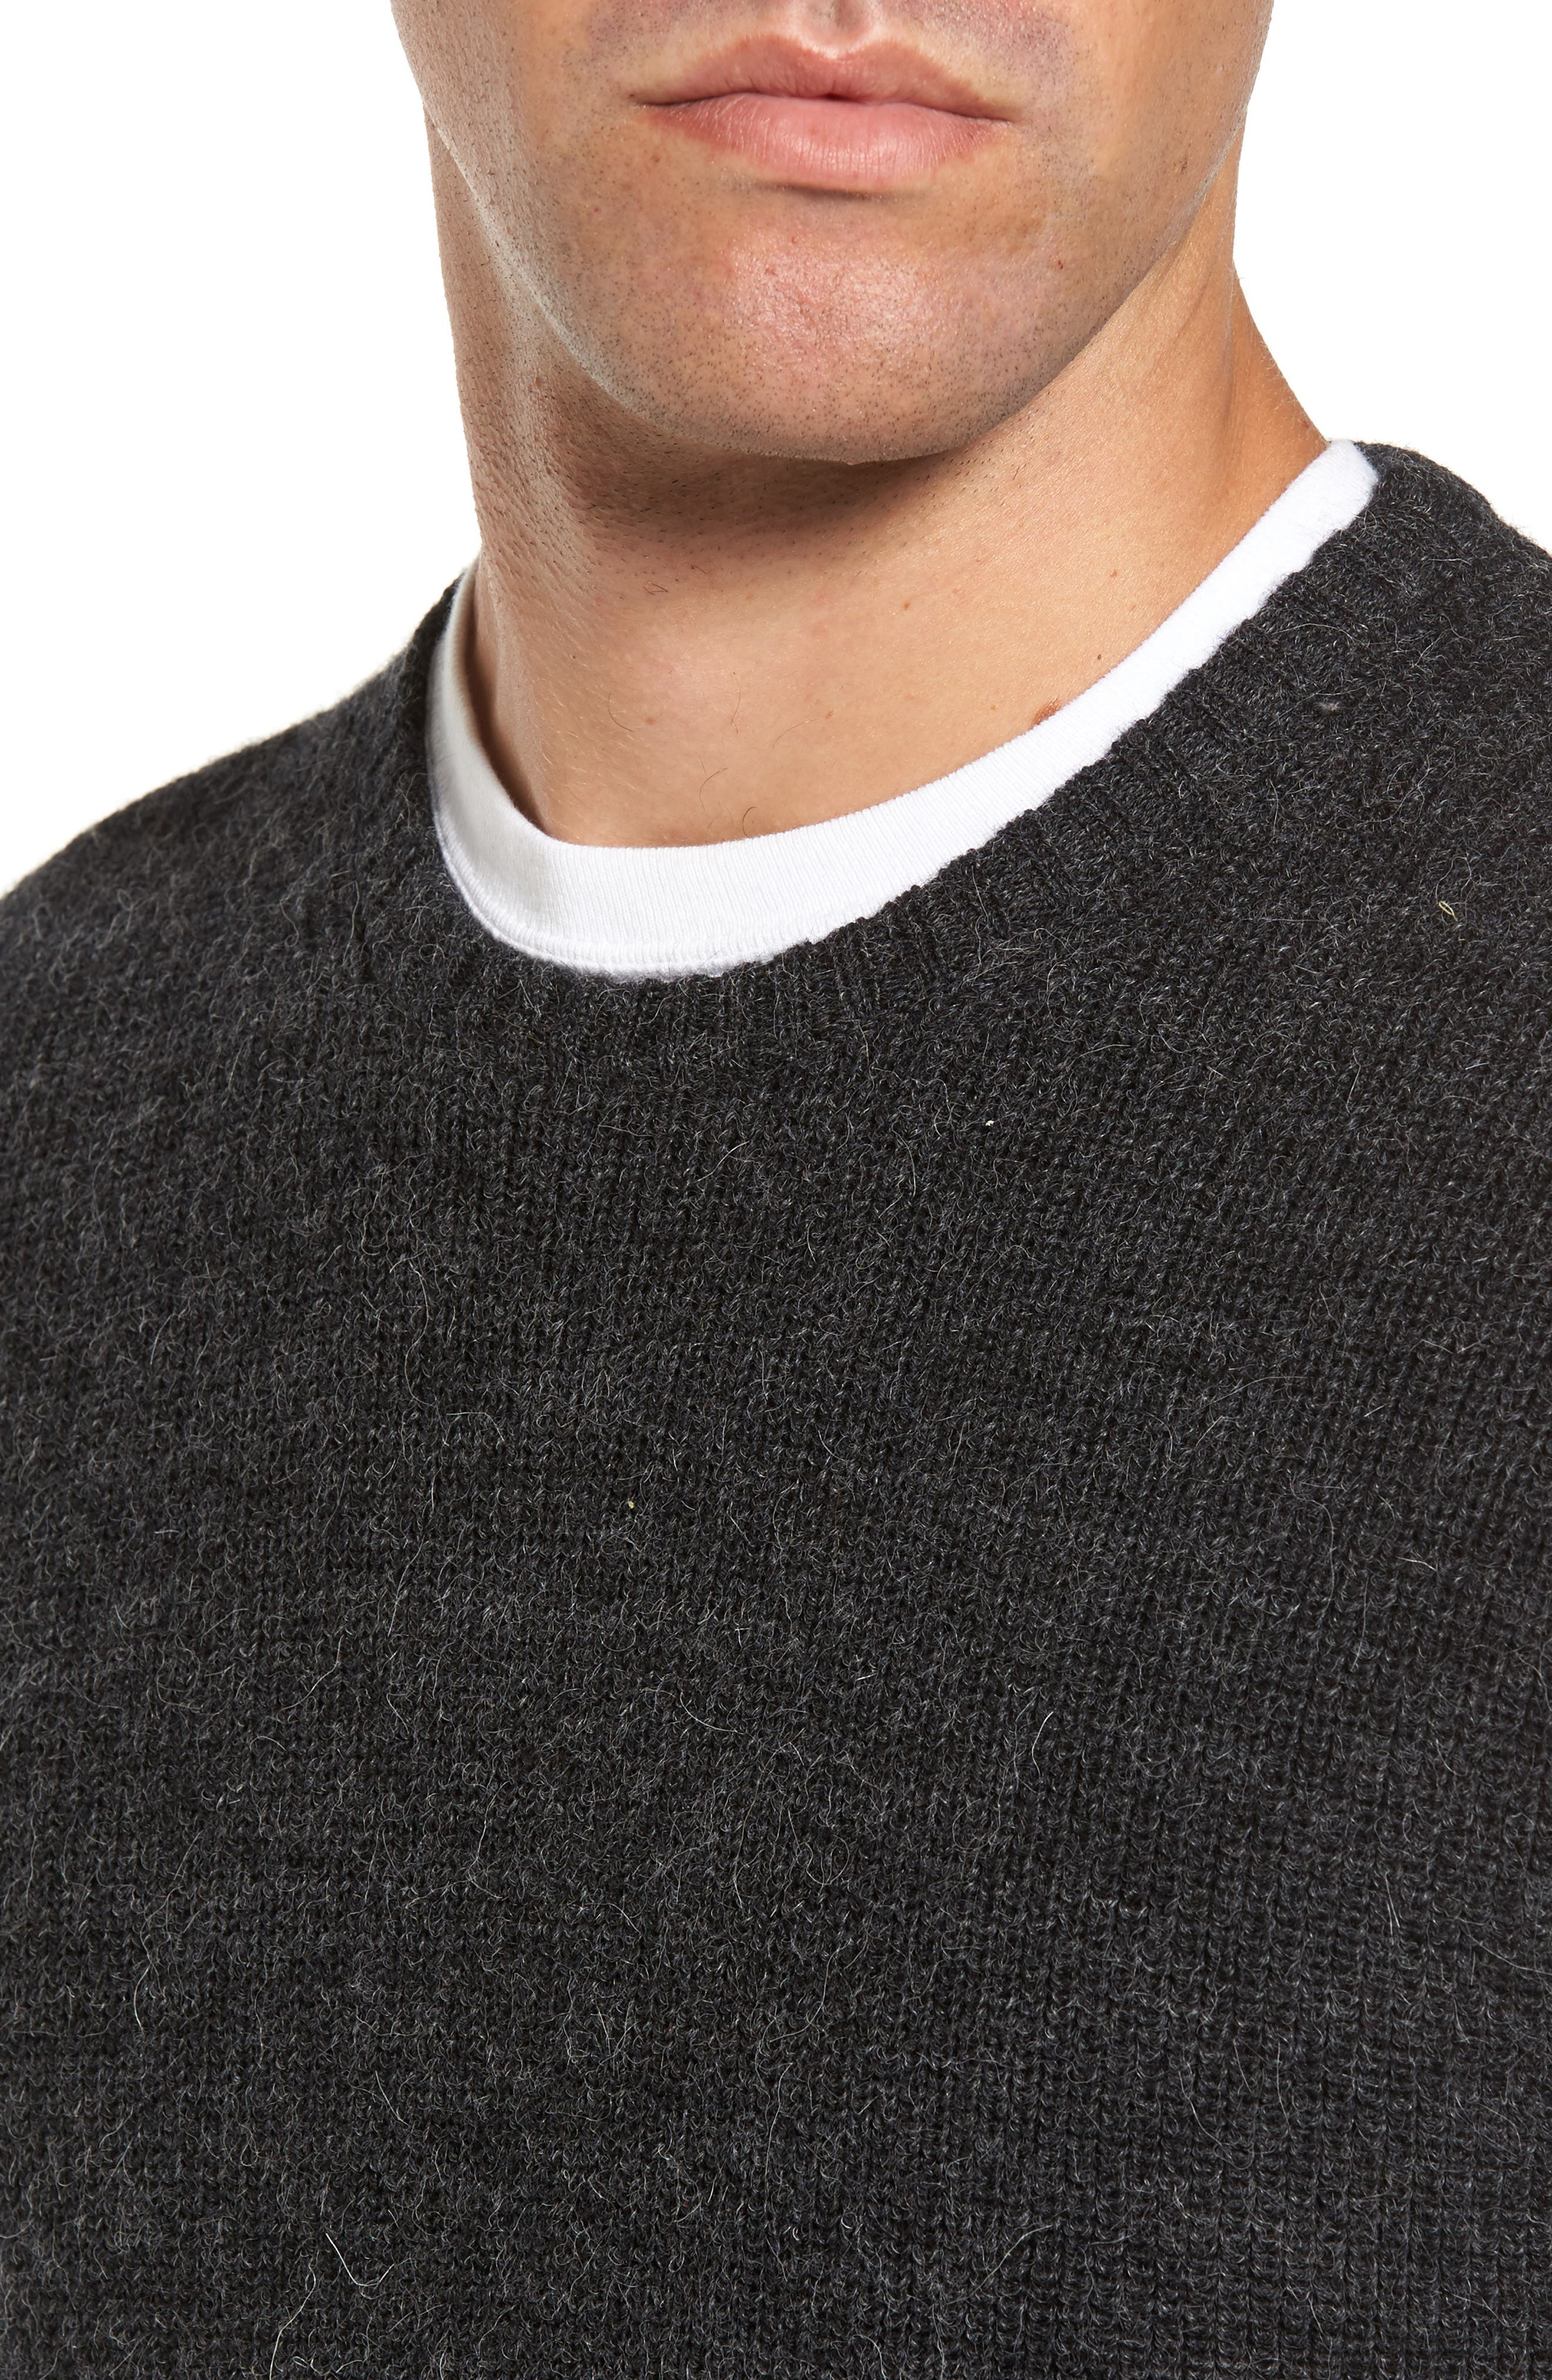 Whalers Bay Merino Wool Blend Sweater,                             Alternate thumbnail 4, color,                             001